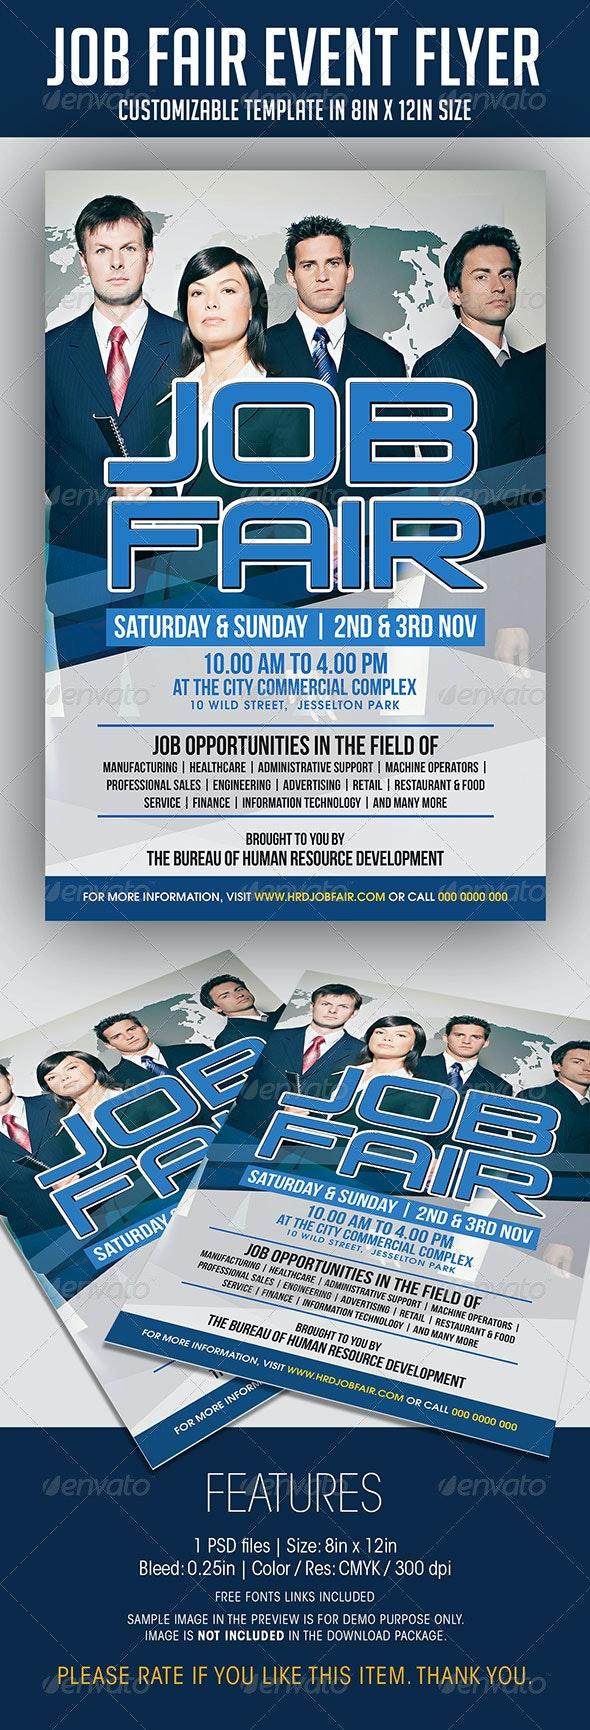 Job Fair Event Flyer - Events Flyers